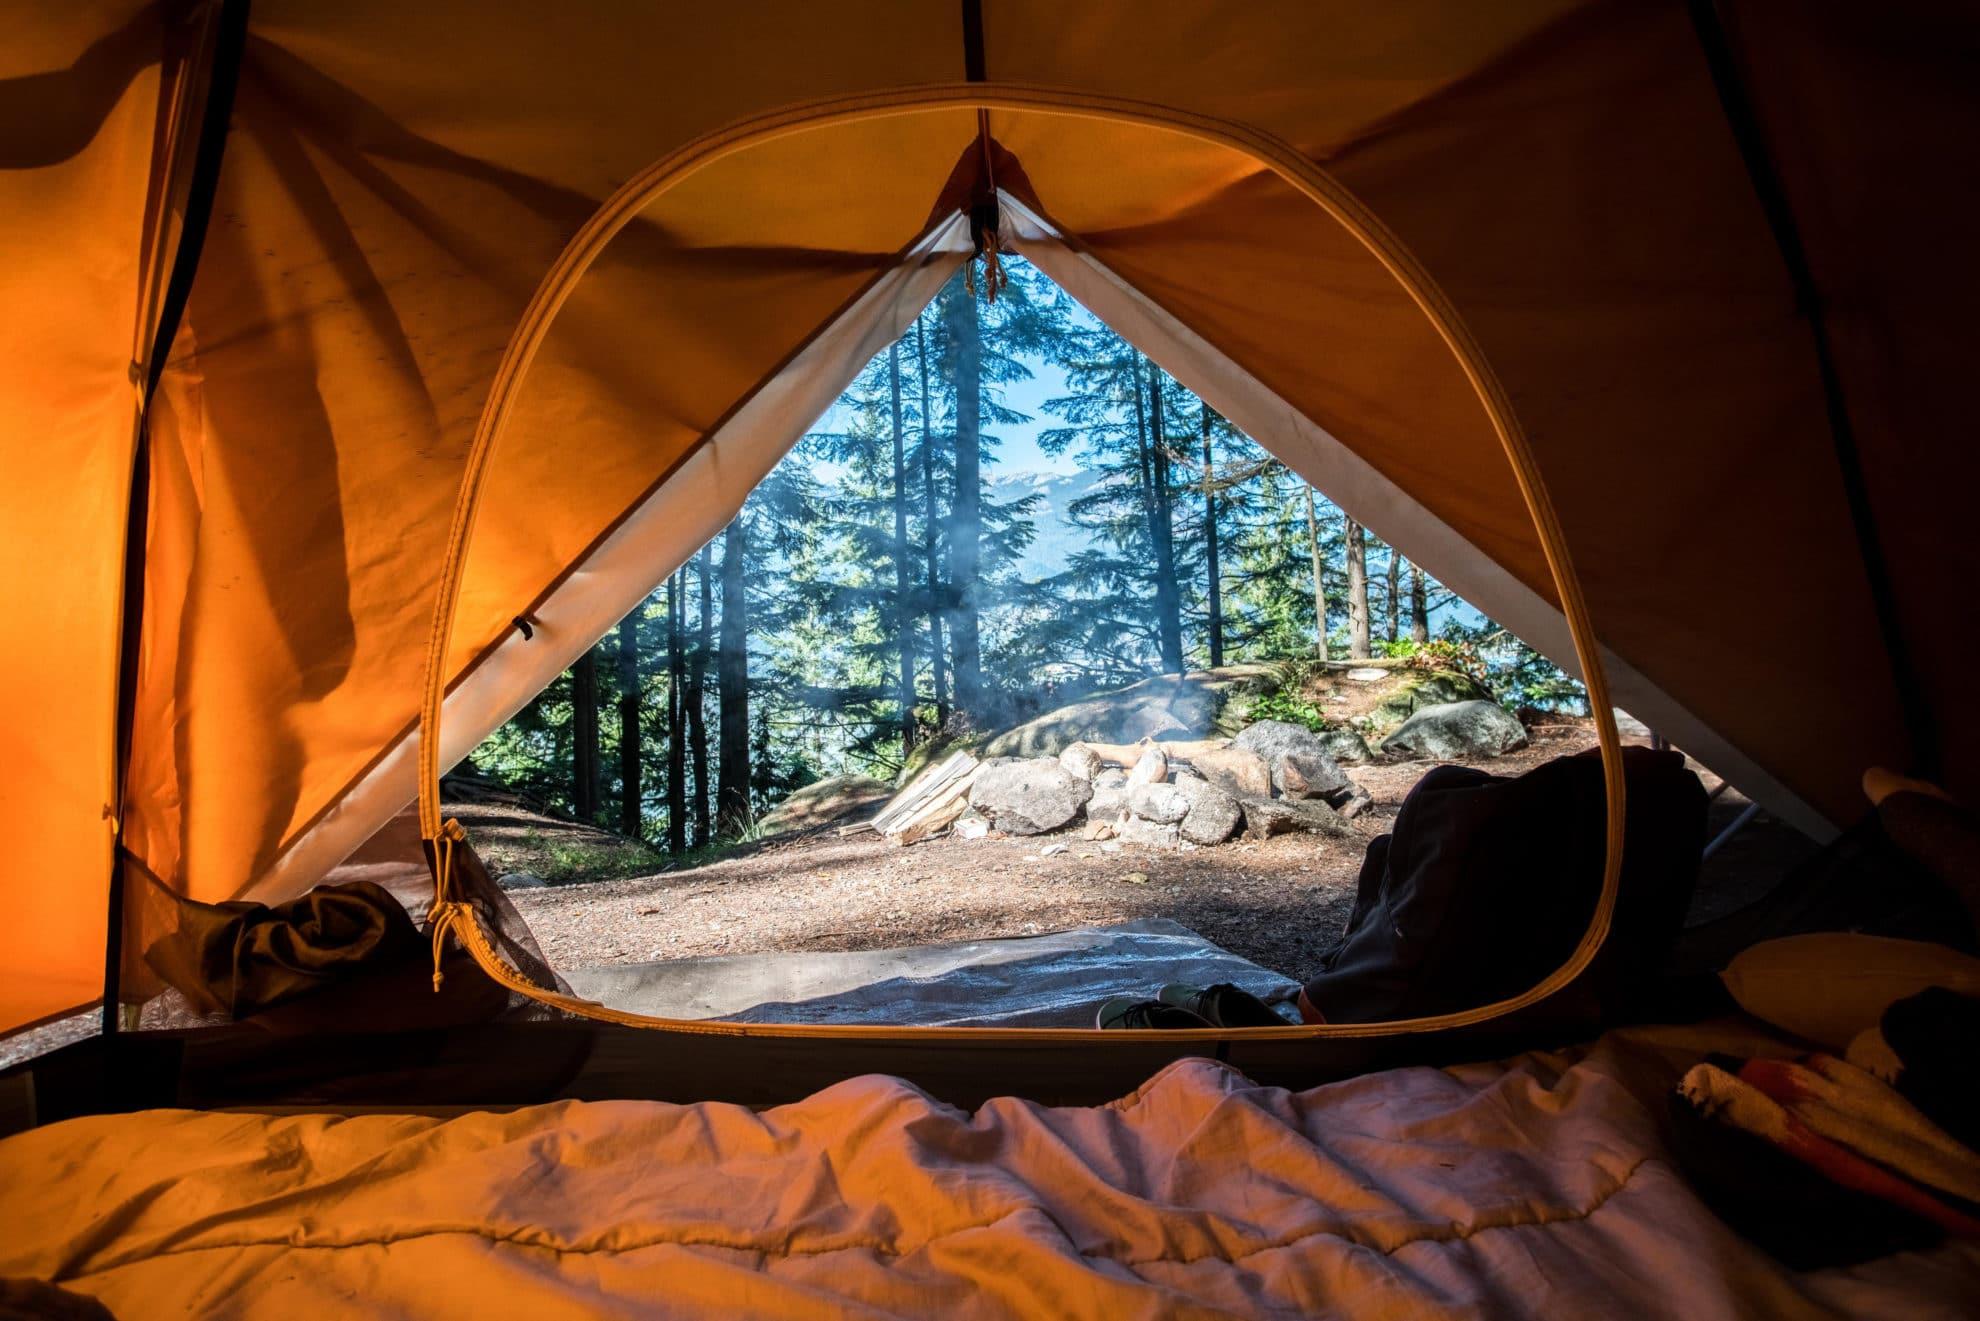 10 x Metal Tent Pegs For Camping Gazebo Ground Sheet Caravan Strong Hooks 18cm